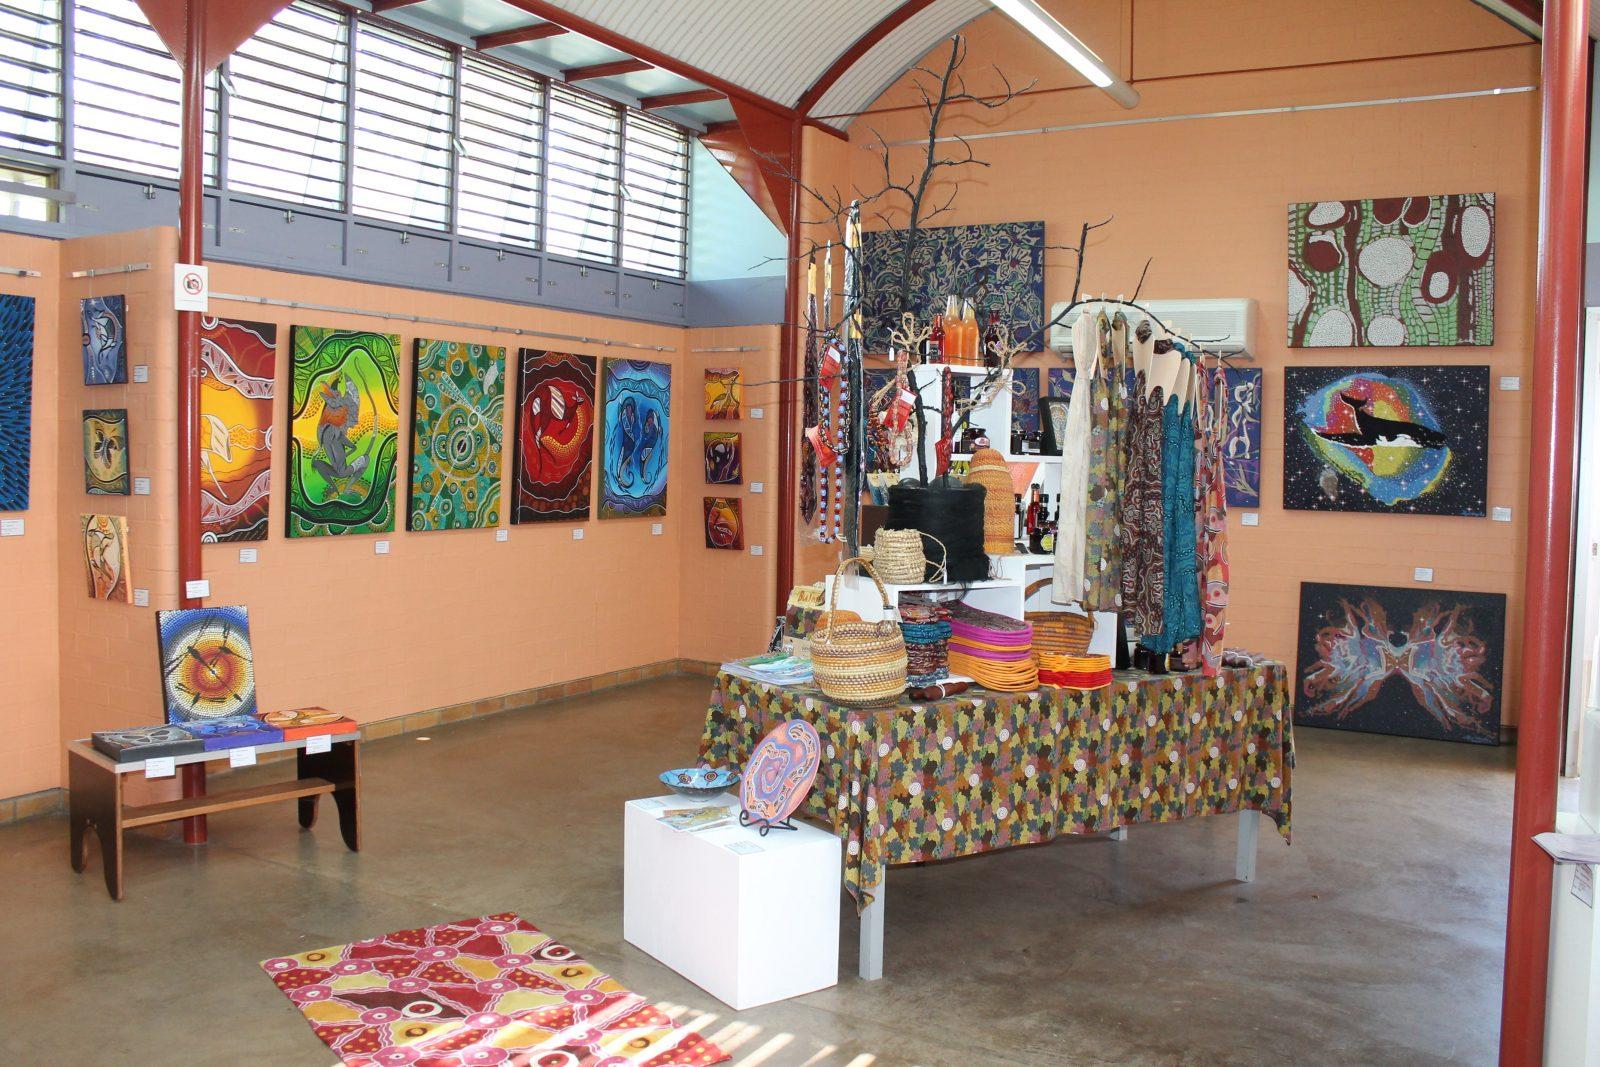 Internal view of Gallery